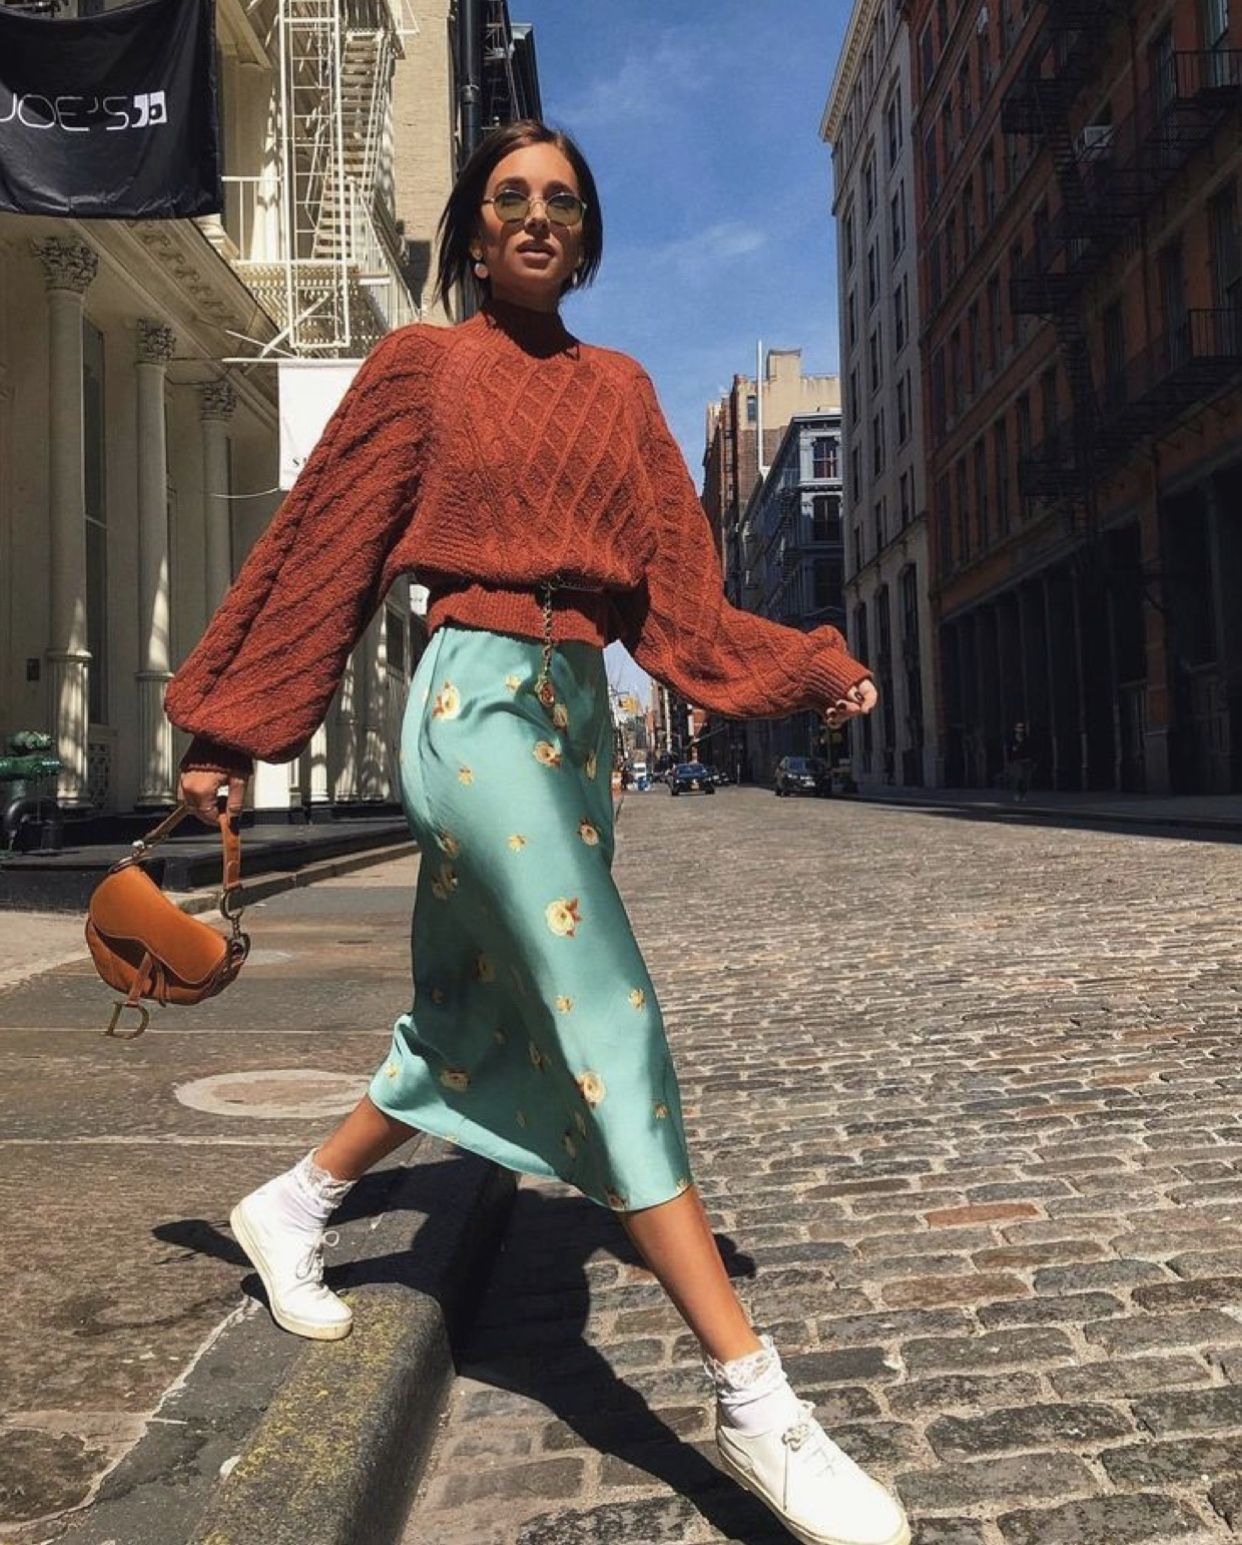 Pin By Anna Rostankowska On Style Fashion Street Style Fashion Inspo Outfits